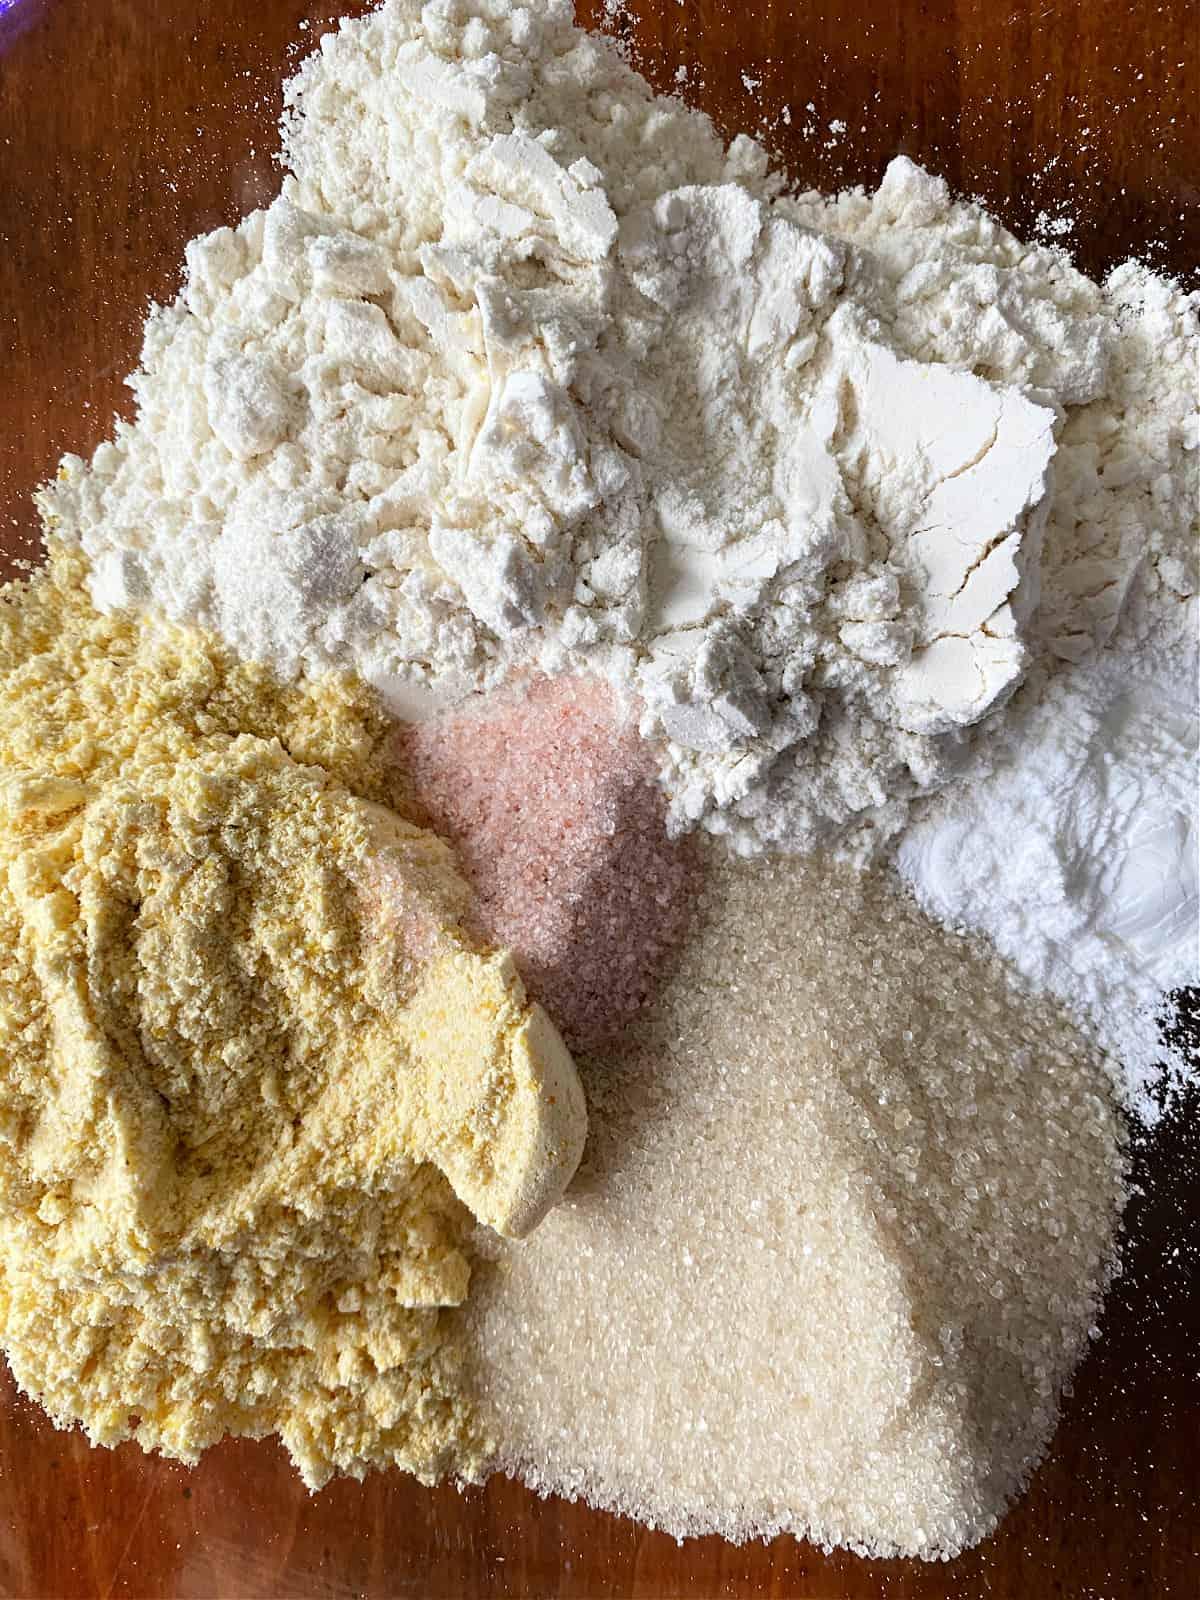 dry ingredients to make cornmuffins